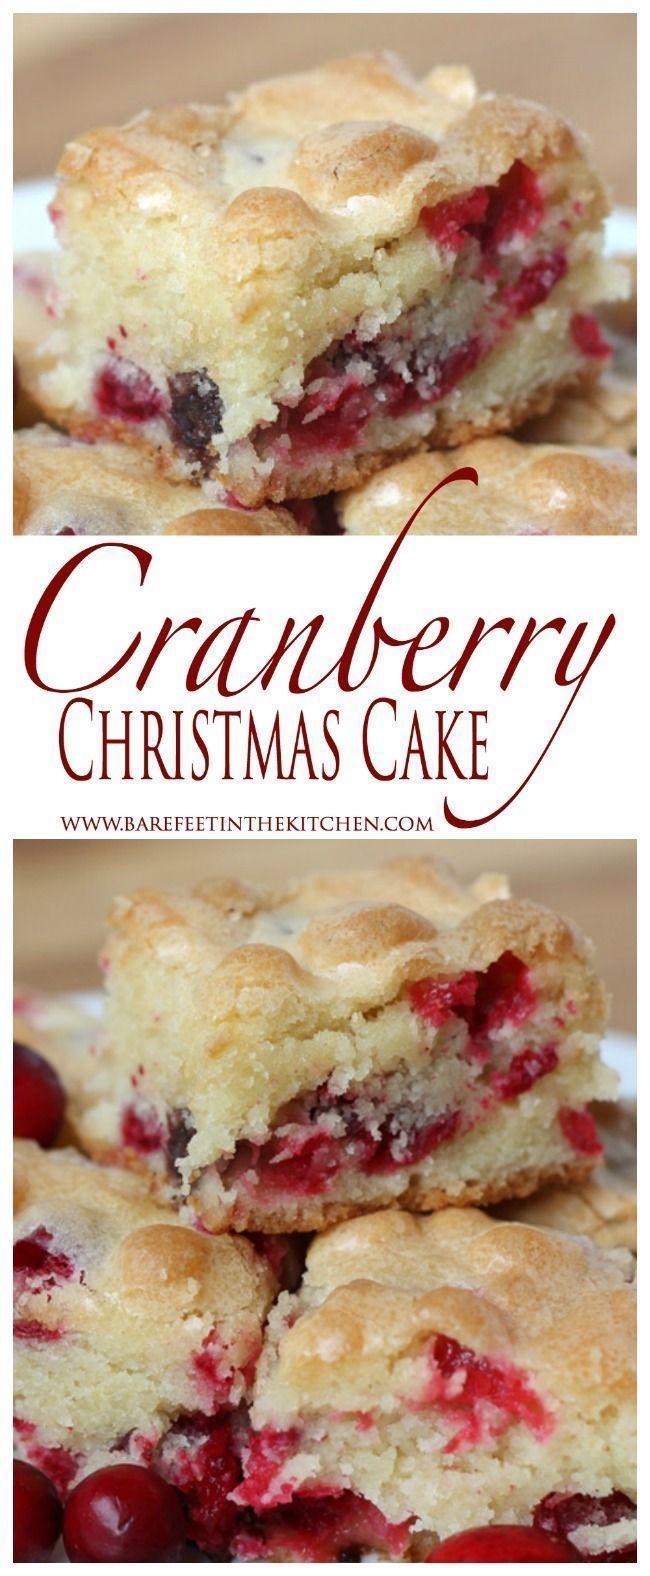 Cranberry Christmas Cake #cranberrychristmascake